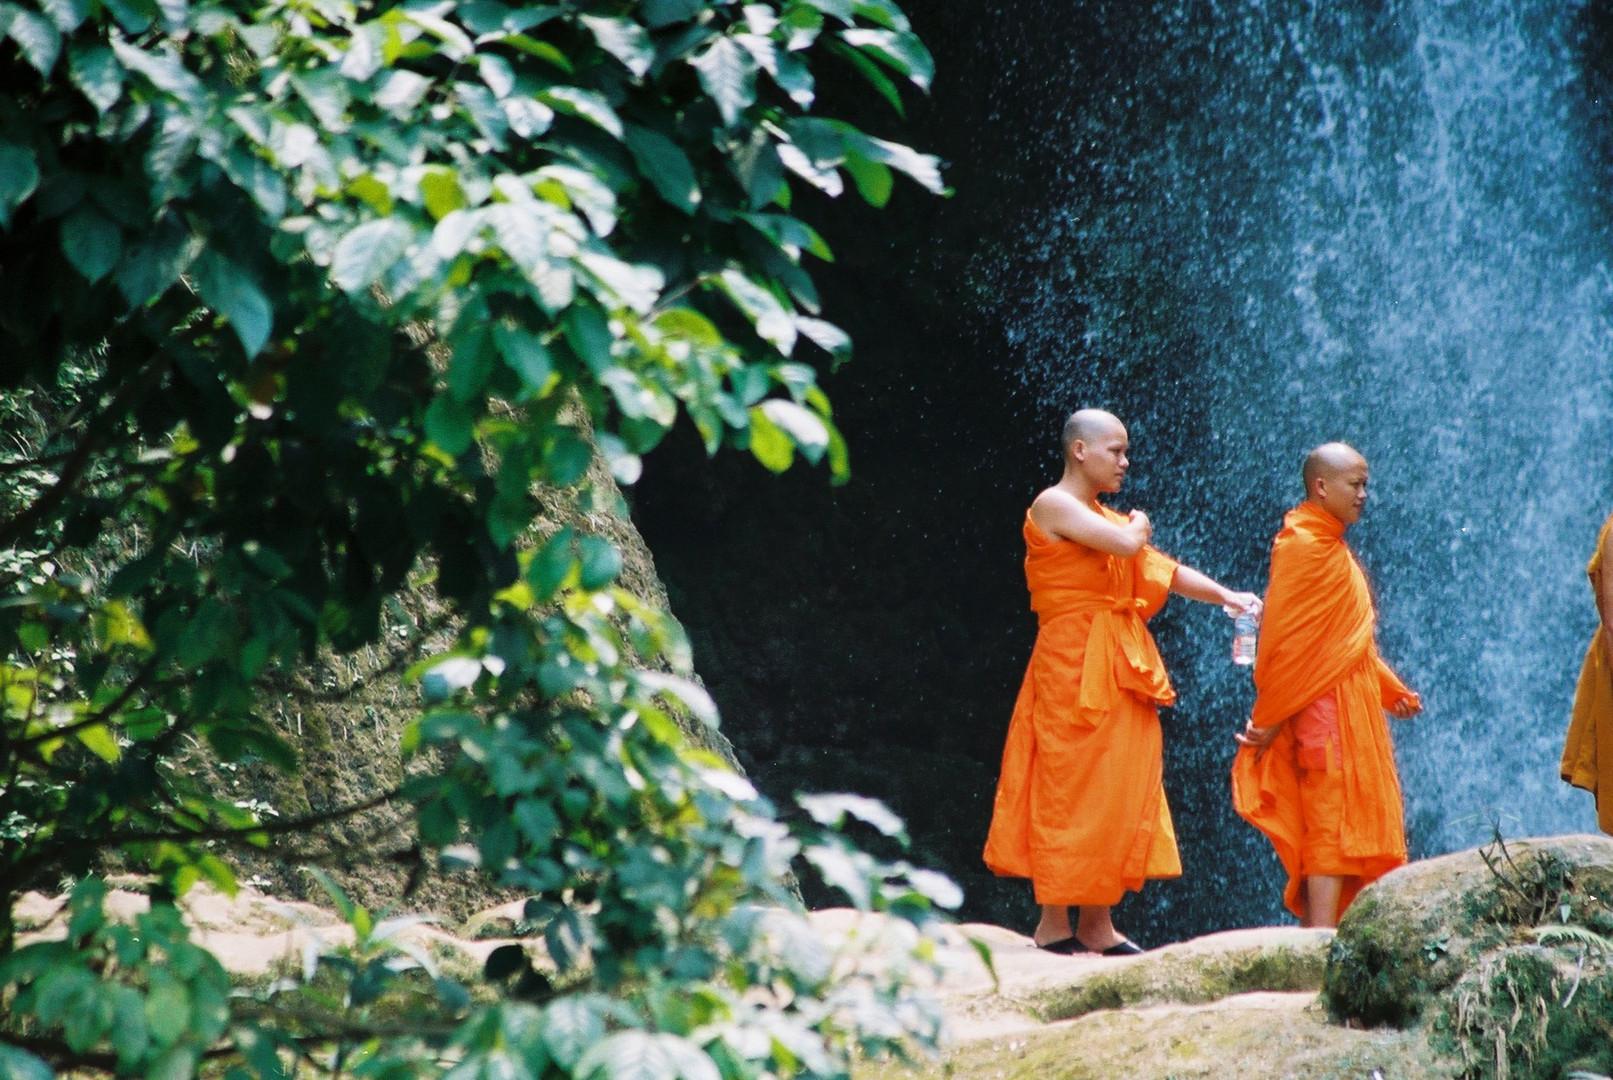 Mönche am Wasserfall, Laos